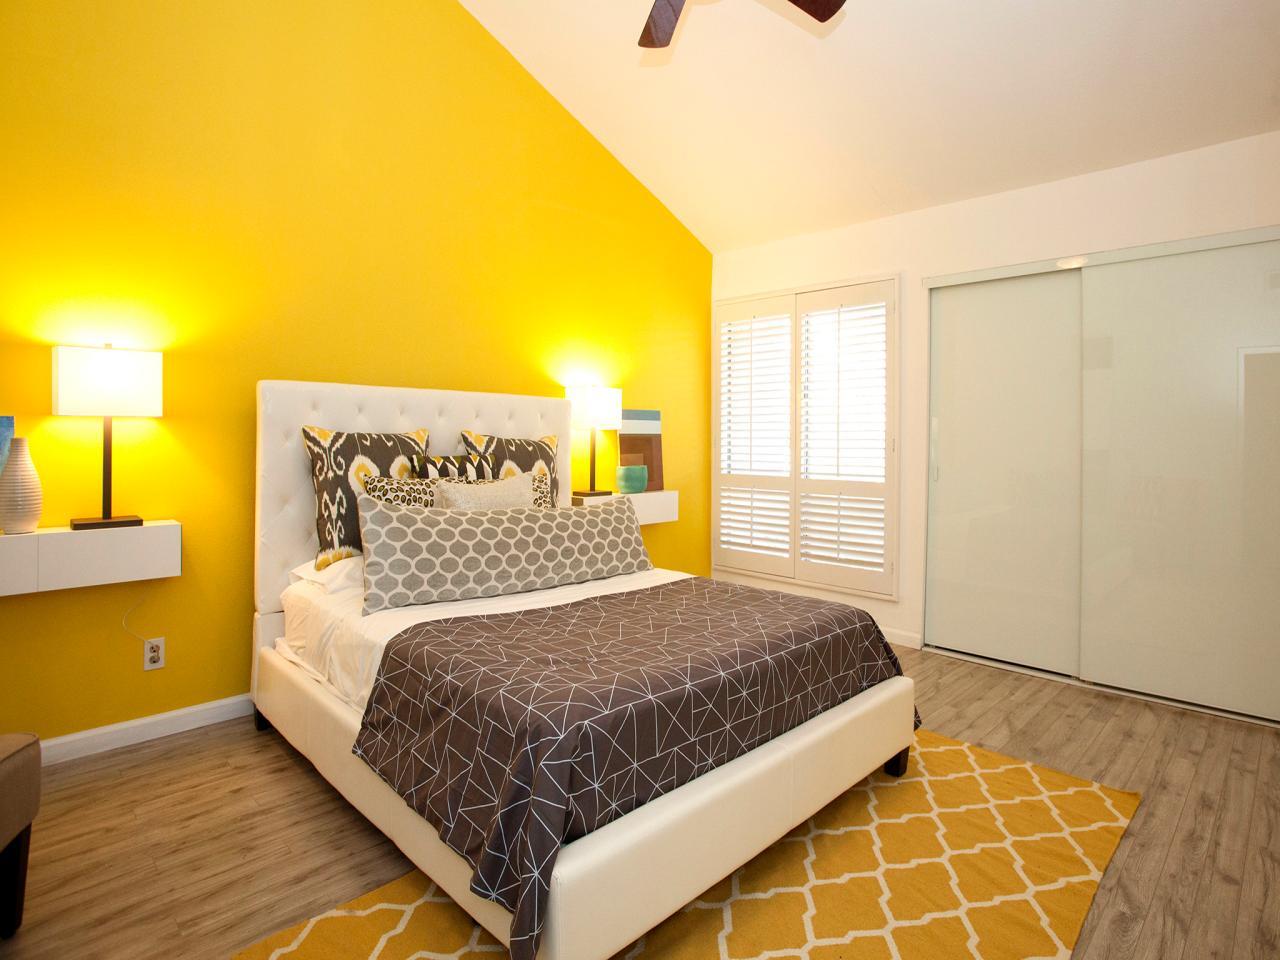 HHUTR210_yellow-contemporary-bedroom.jpg.rend.hgtvcom.1280.960.jpeg